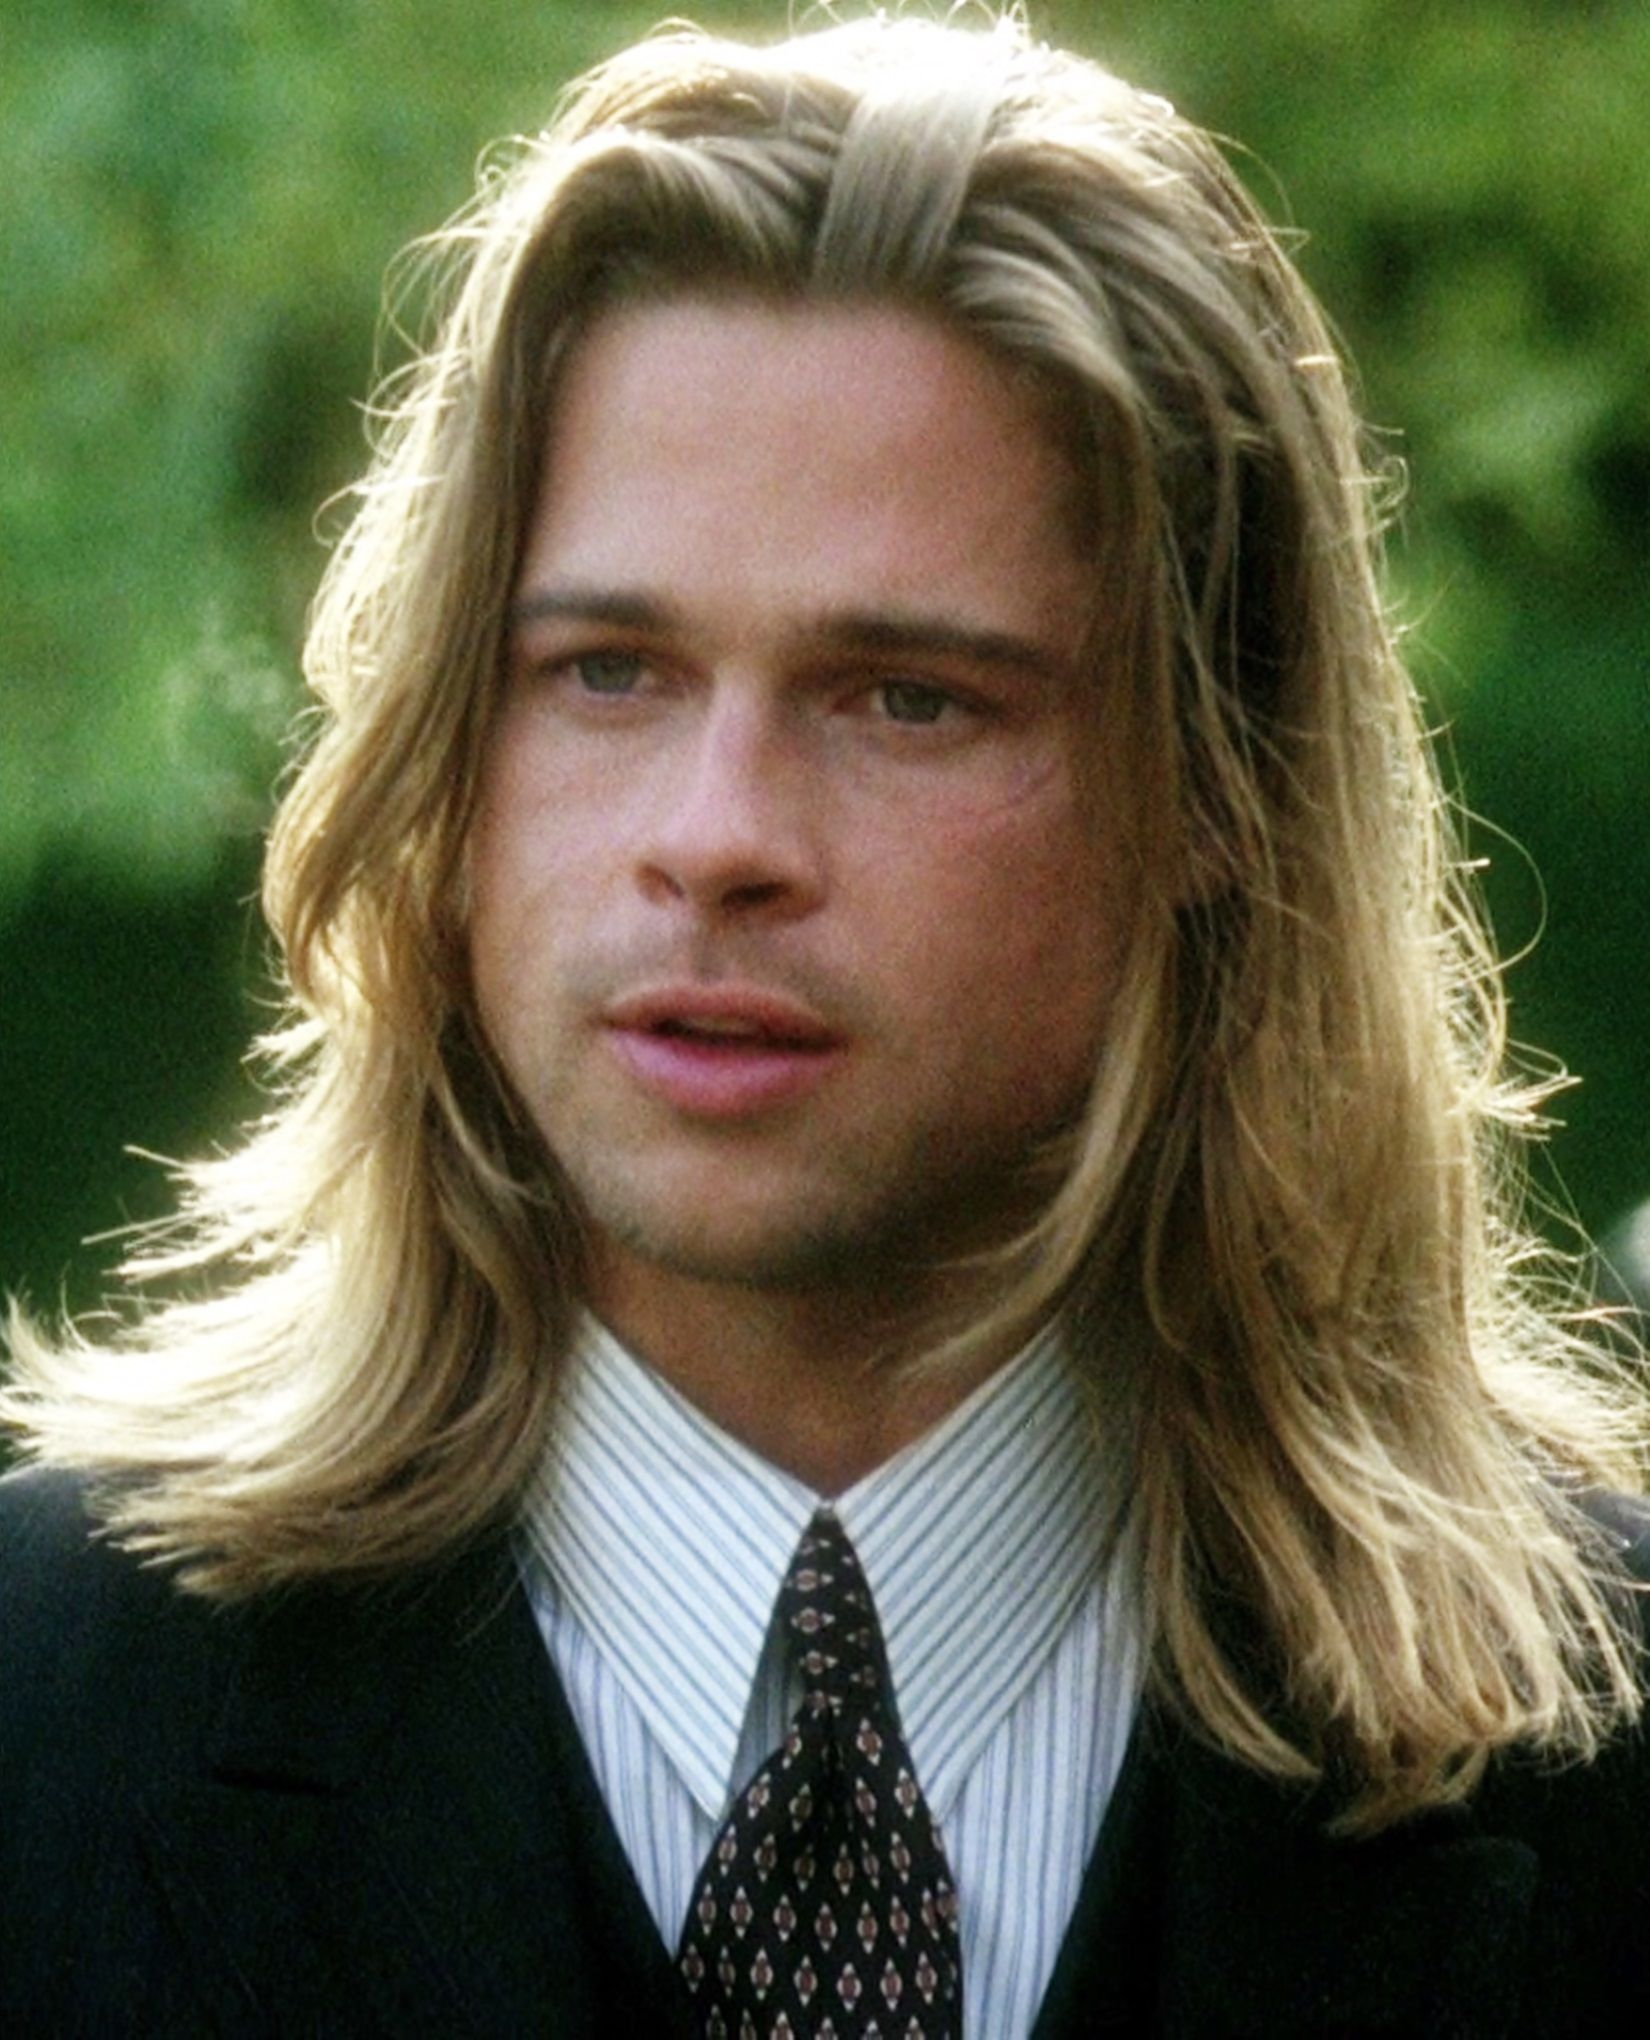 Brad Pitt Ok Just Kidding Nobody Ever Said I Look Like Him